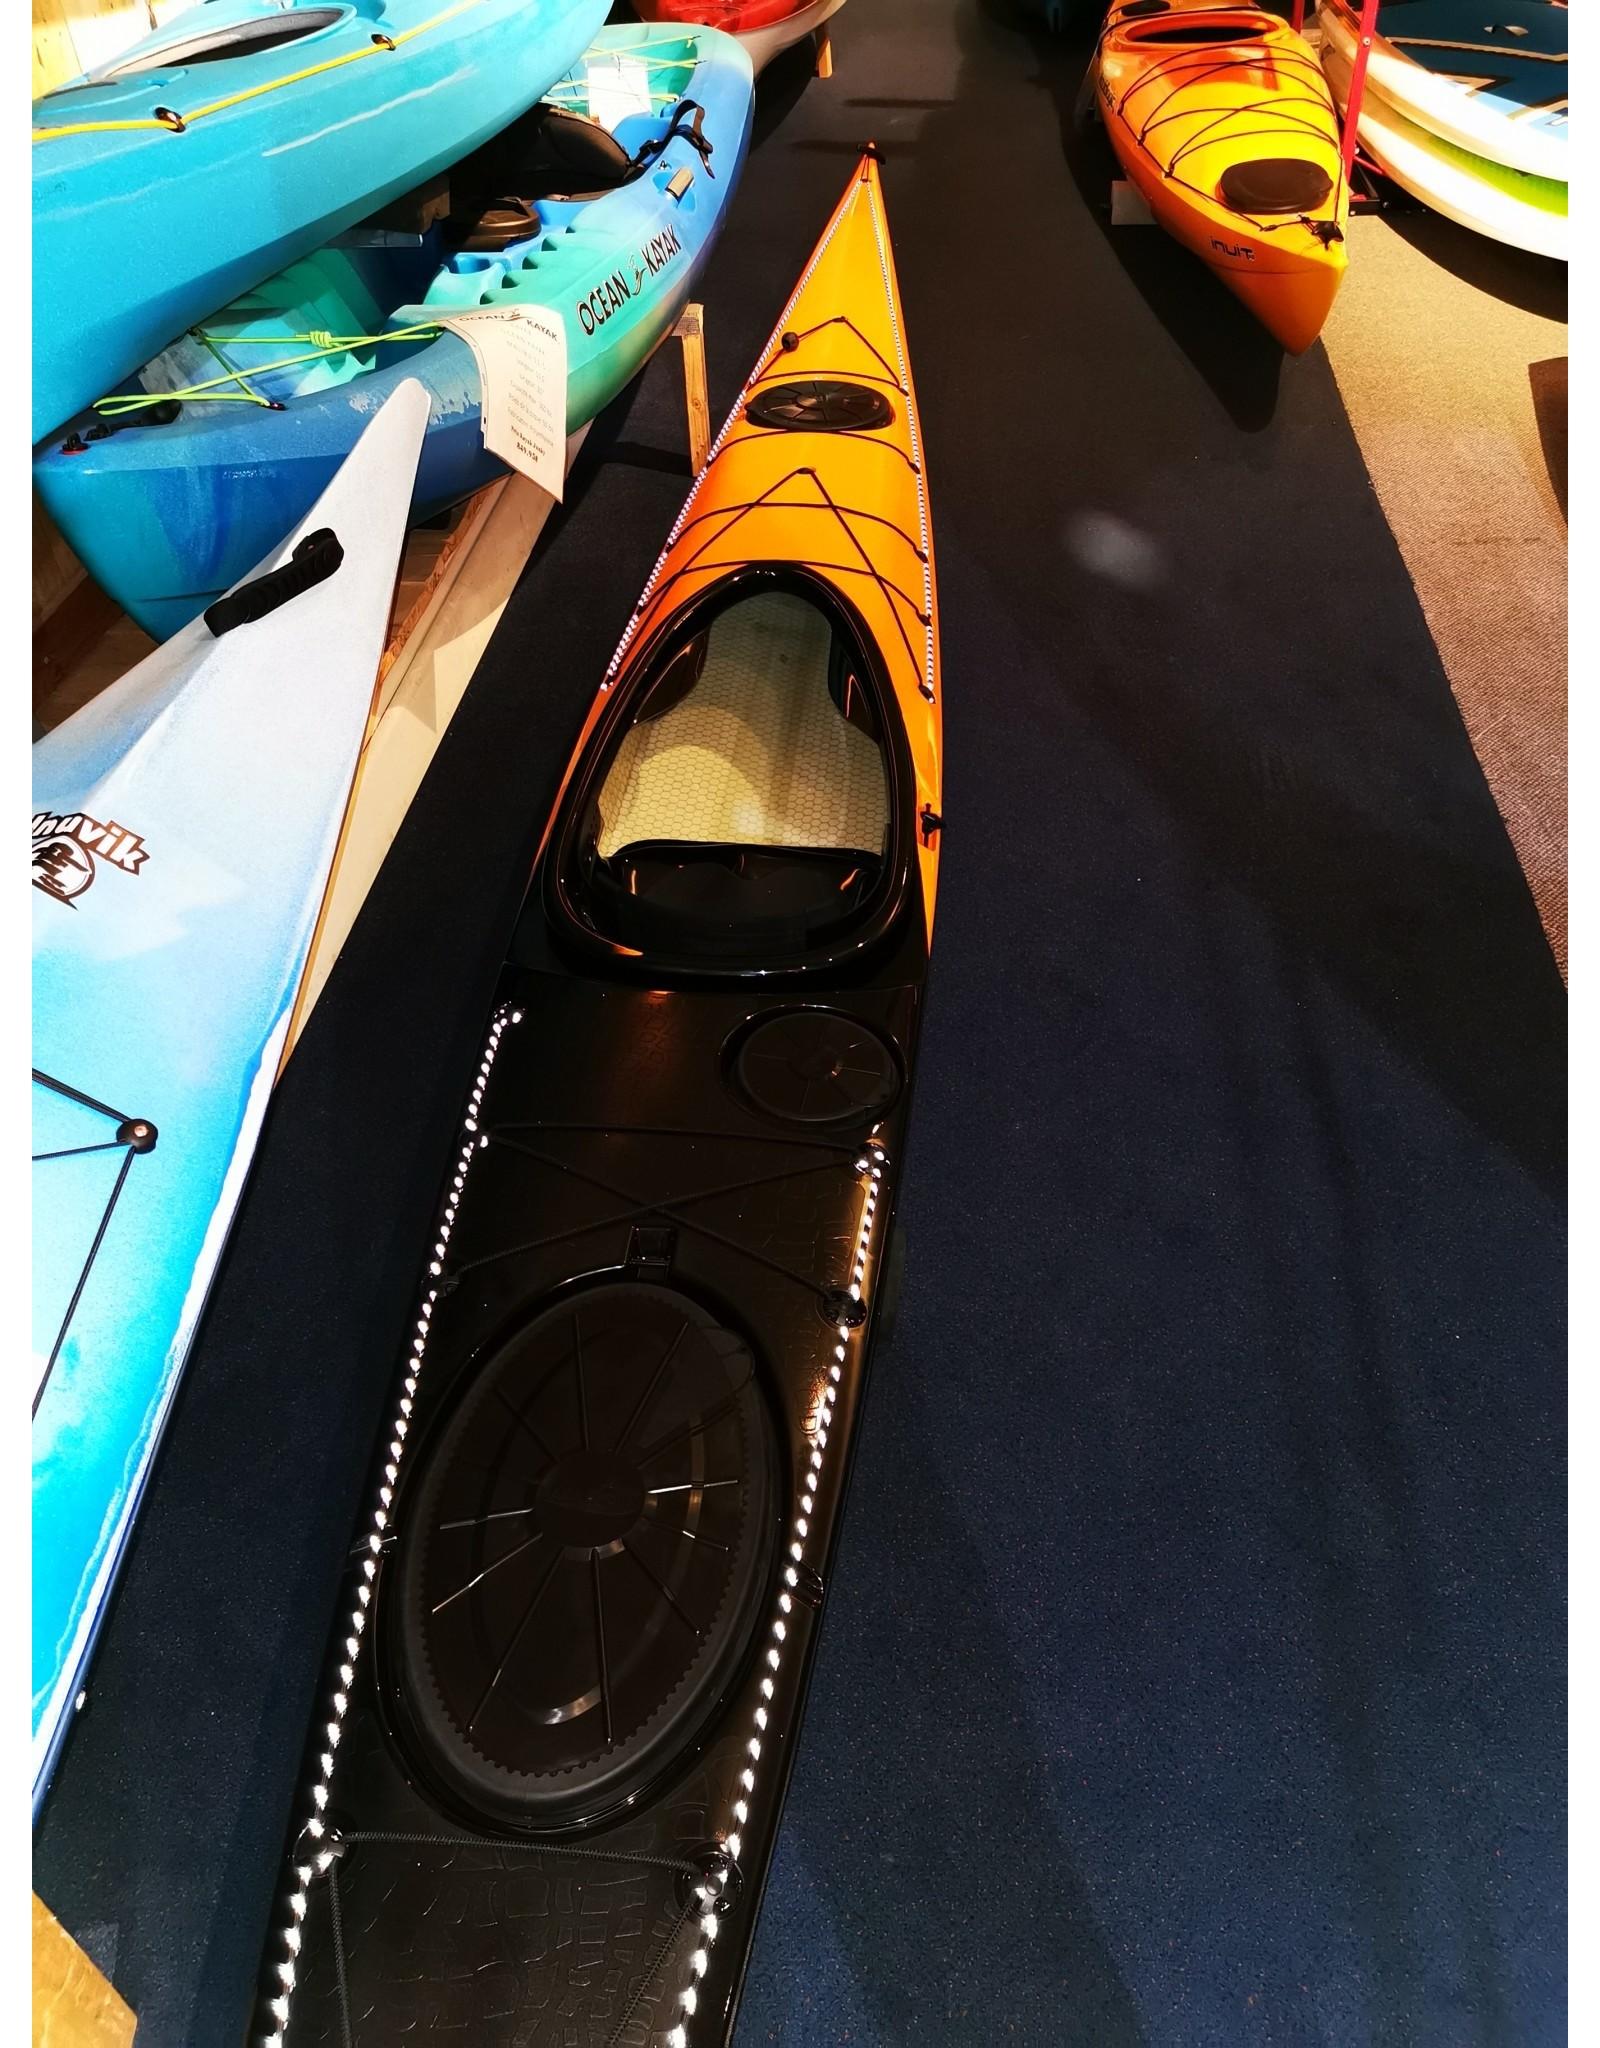 Zegul Zegul kayak Greenland T A-Core Orange/Black